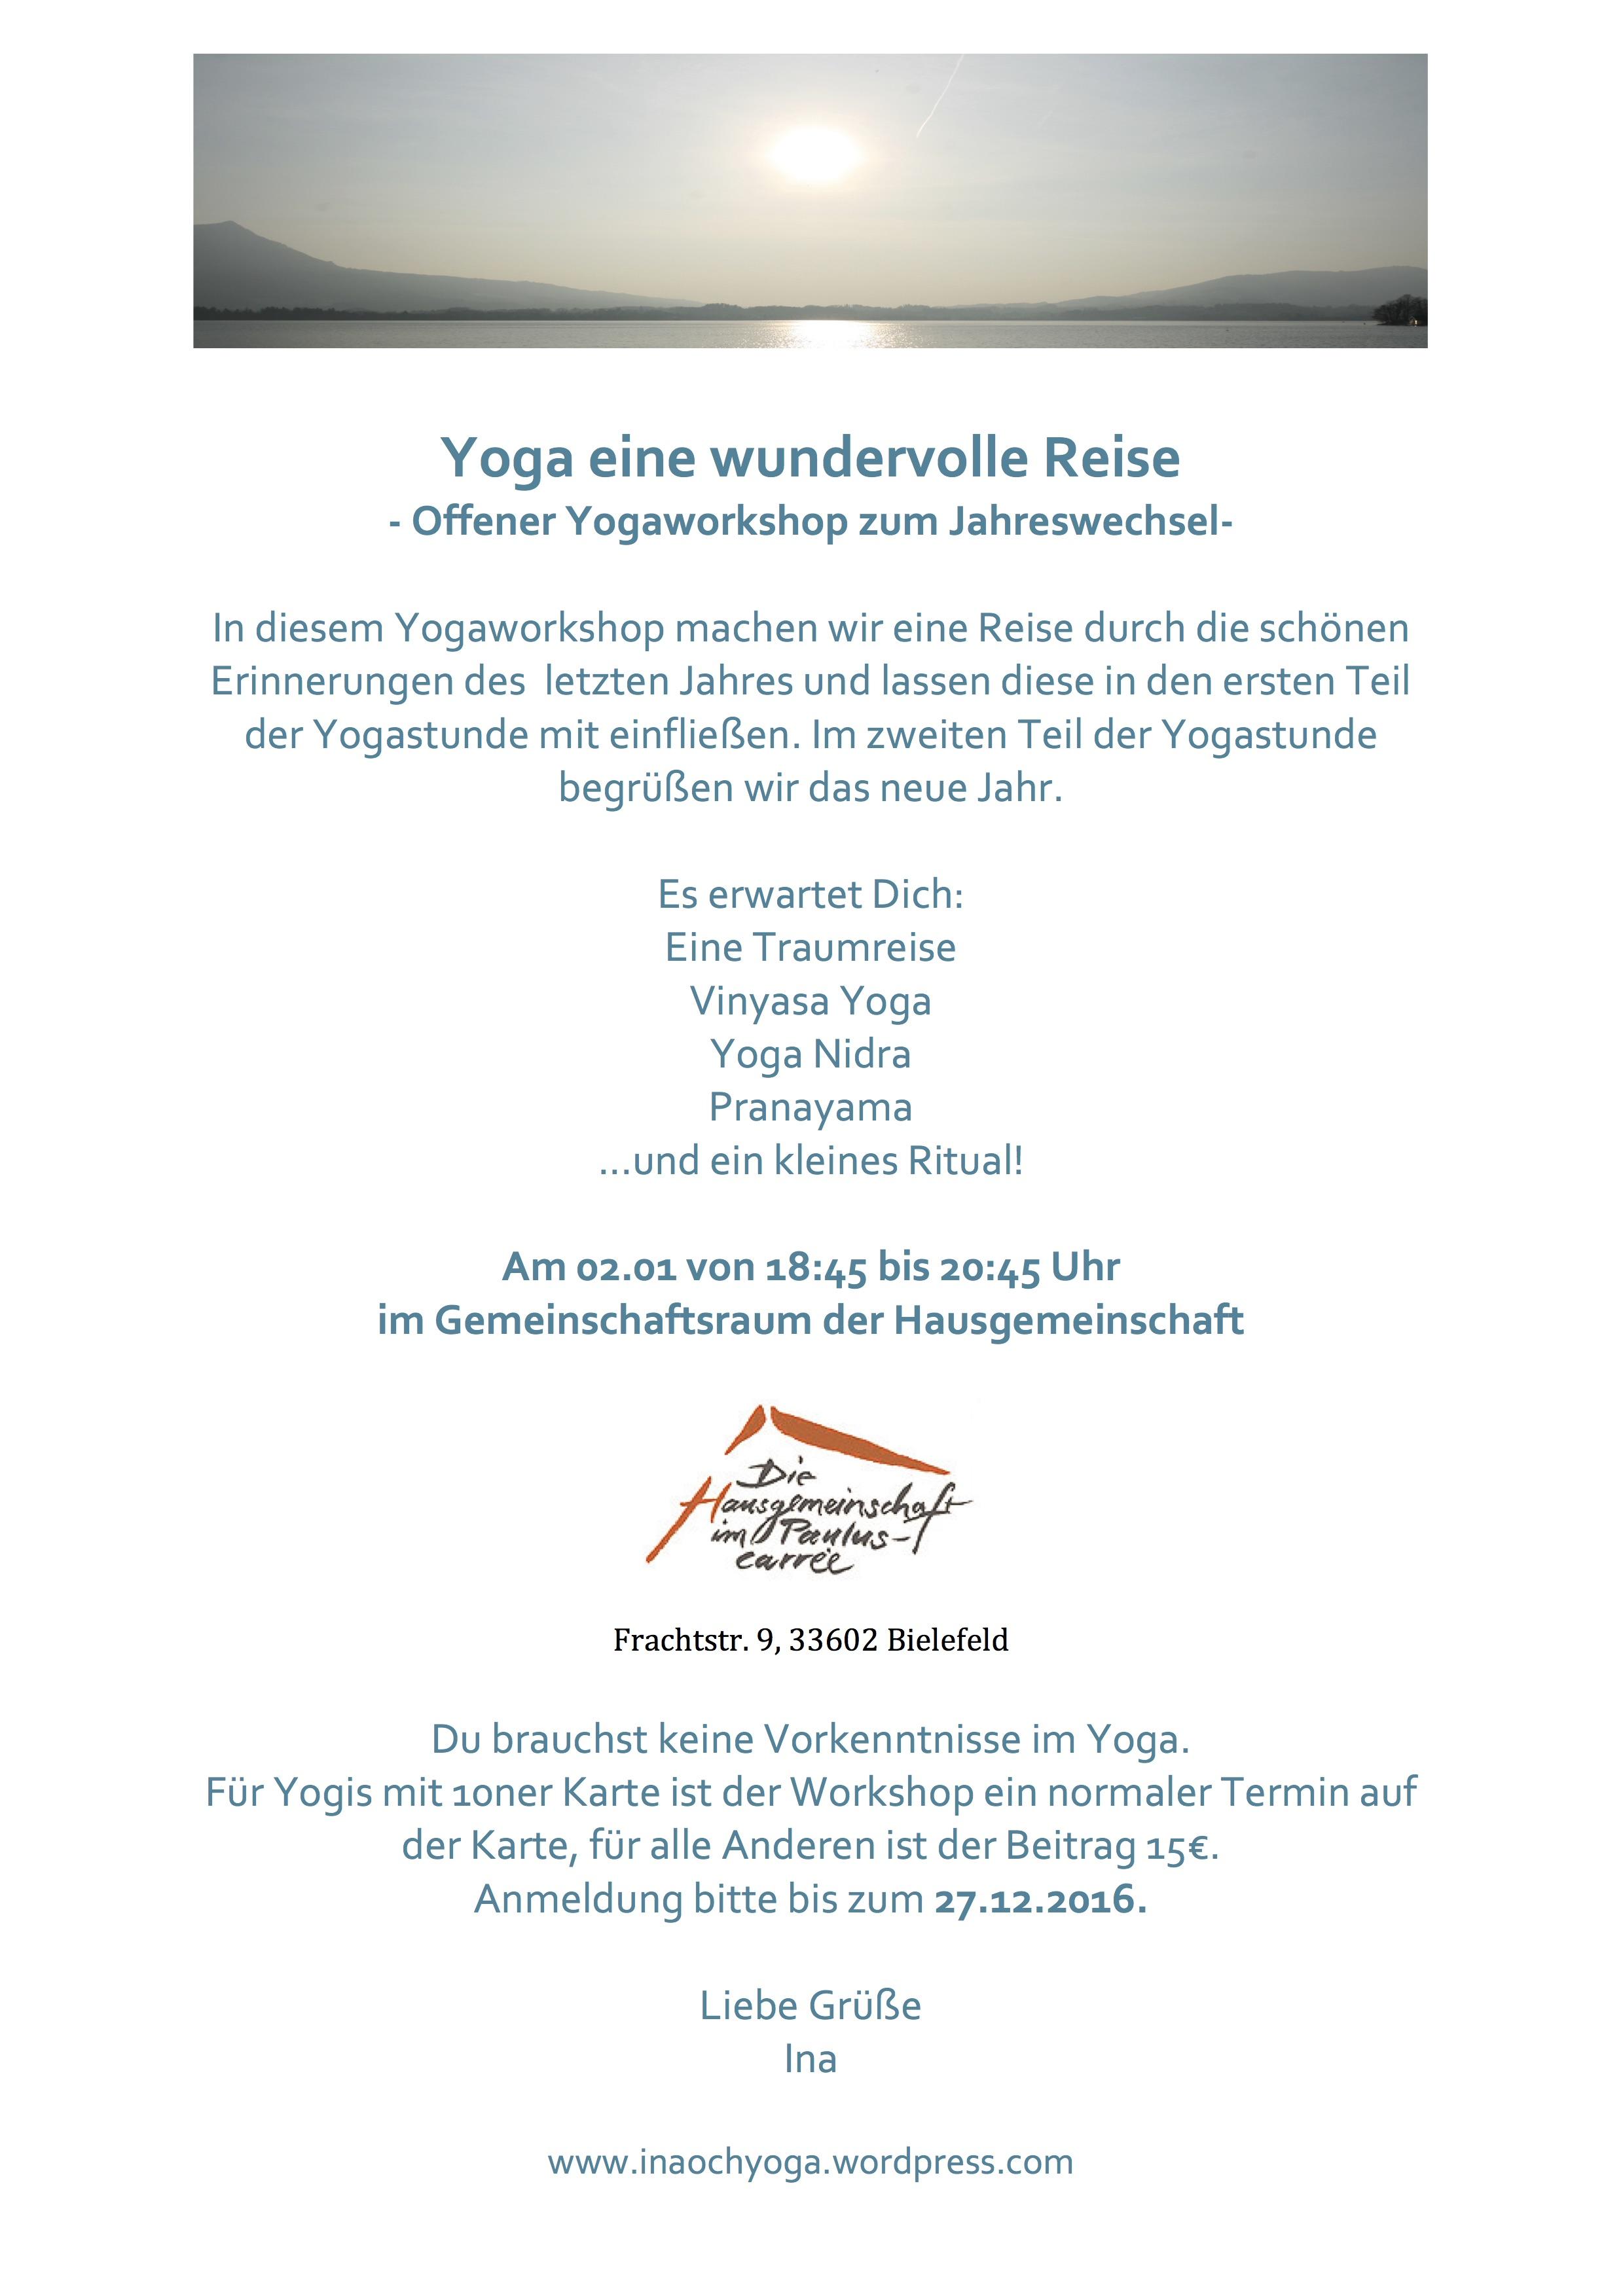 Yoga Workshop Jahreswechsel